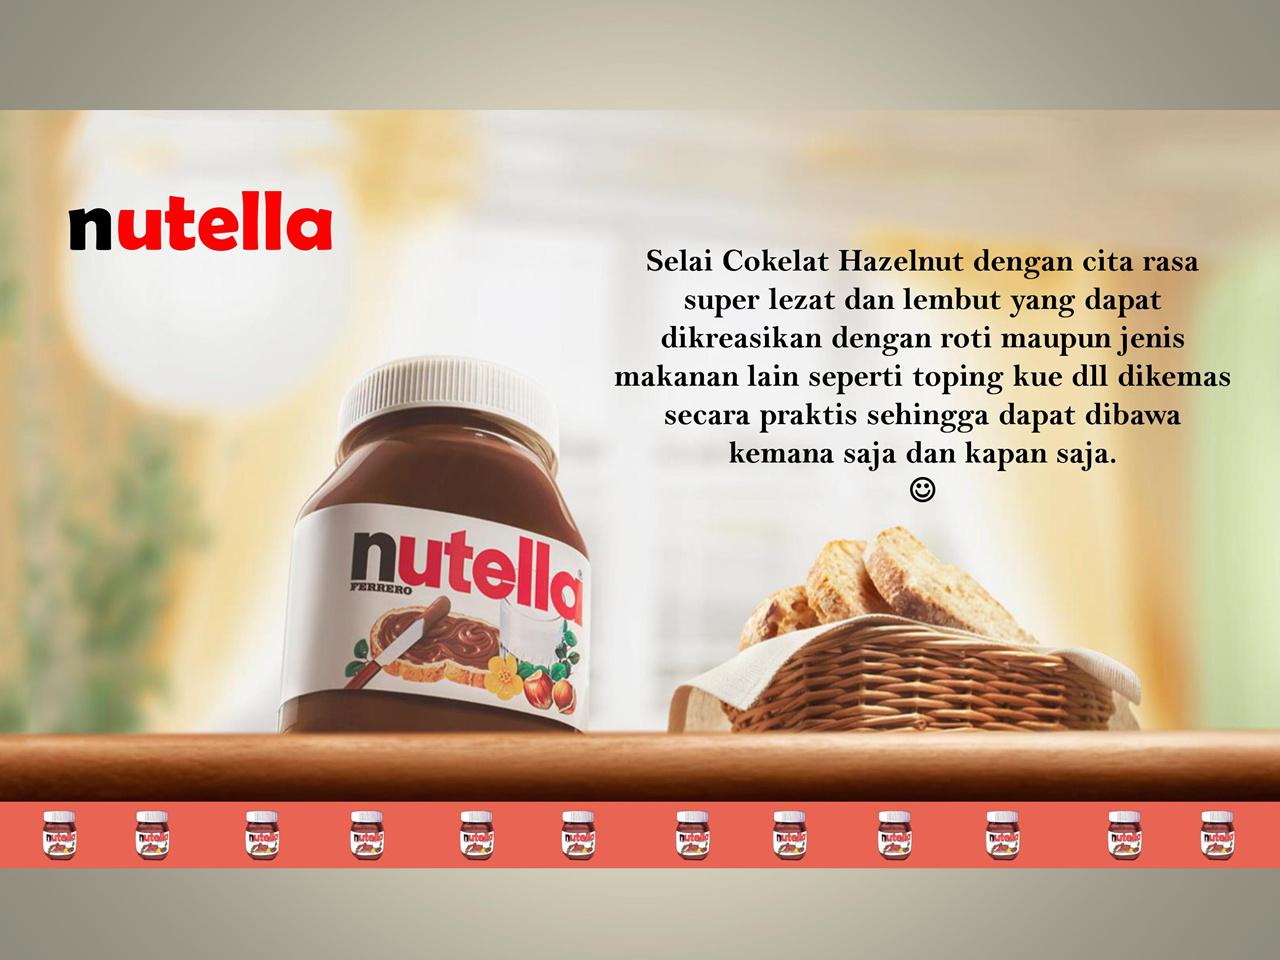 Nutella Selai Coklat Hazelnut Daftar Harga Terlengkap Indonesia Ferrero 350g Highlights